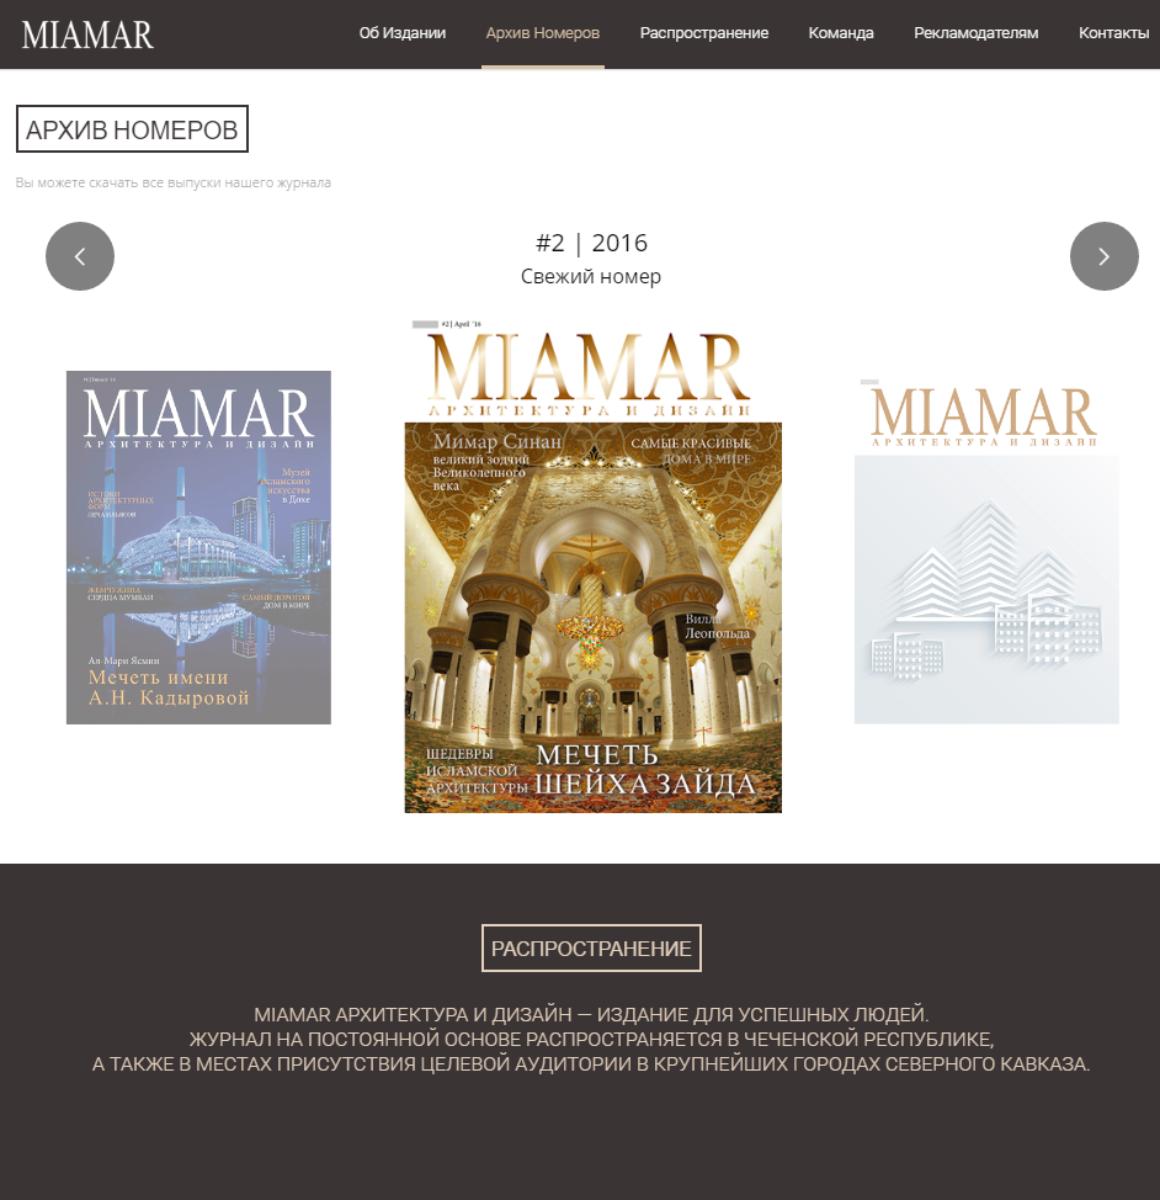 Сайт журнала MIAMAR Архитектура и Дизайн